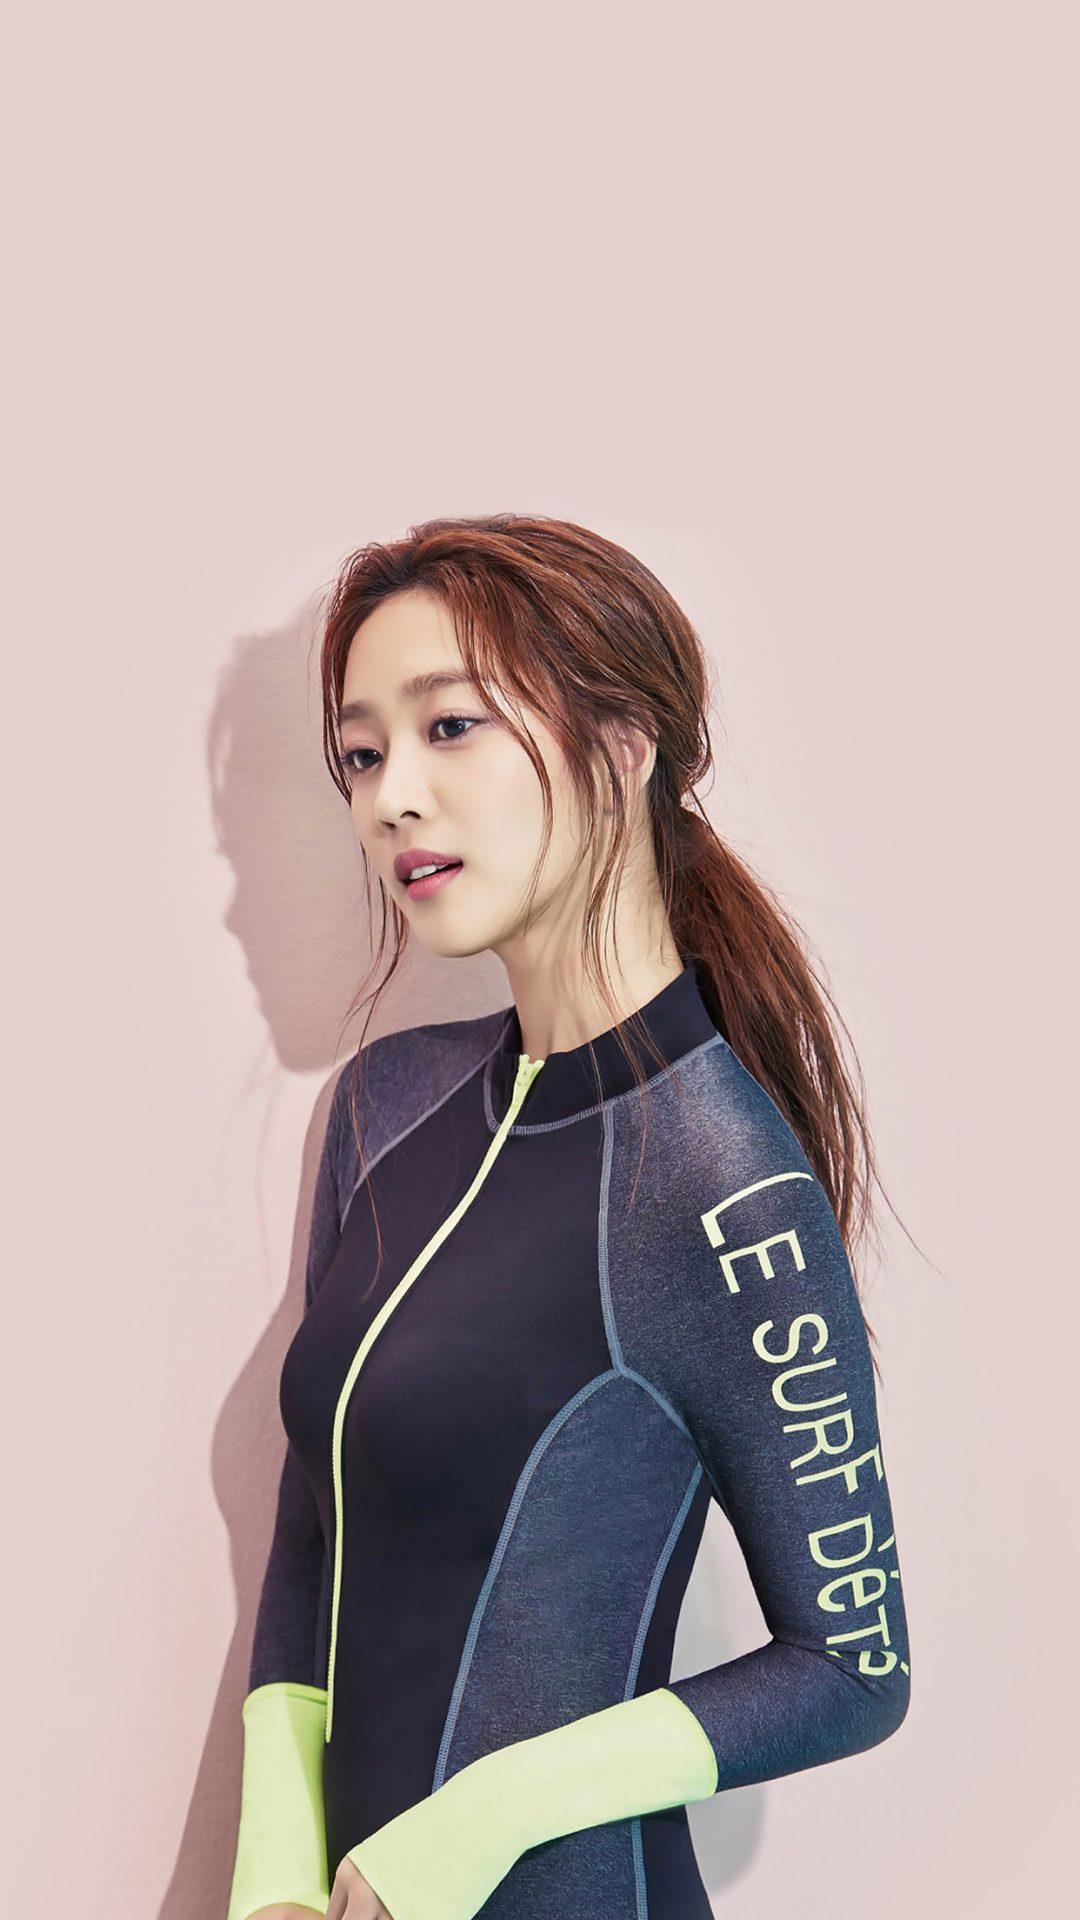 Kpop Jo Boa Girl Summer Cute